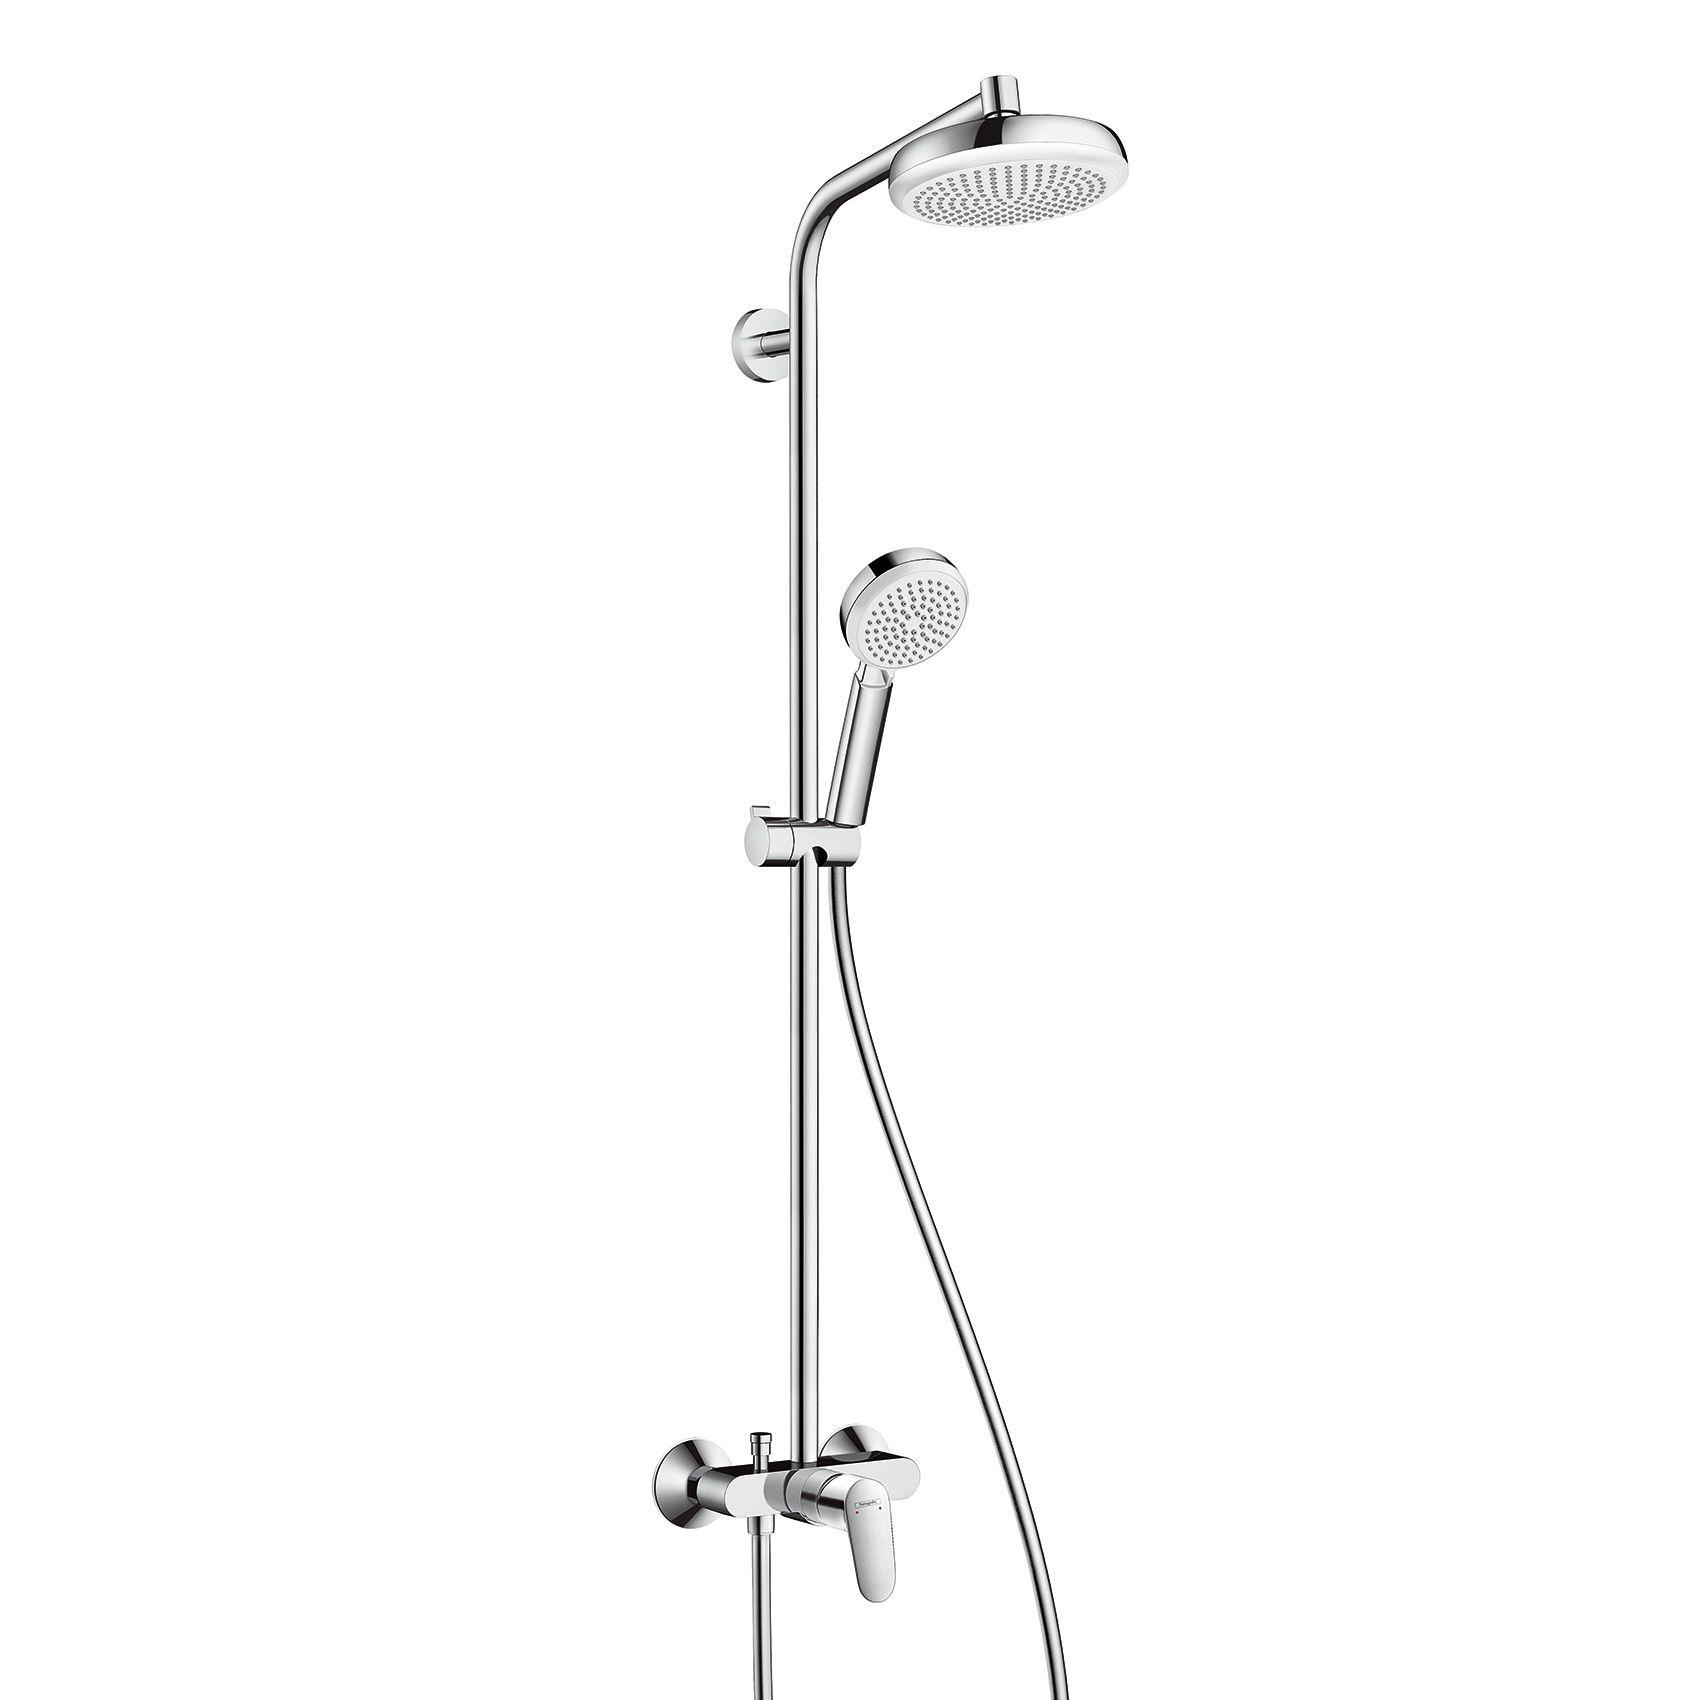 hansgrohe crometta 160 1jet showerpipe with single lever mixer apart industriel pinterest. Black Bedroom Furniture Sets. Home Design Ideas